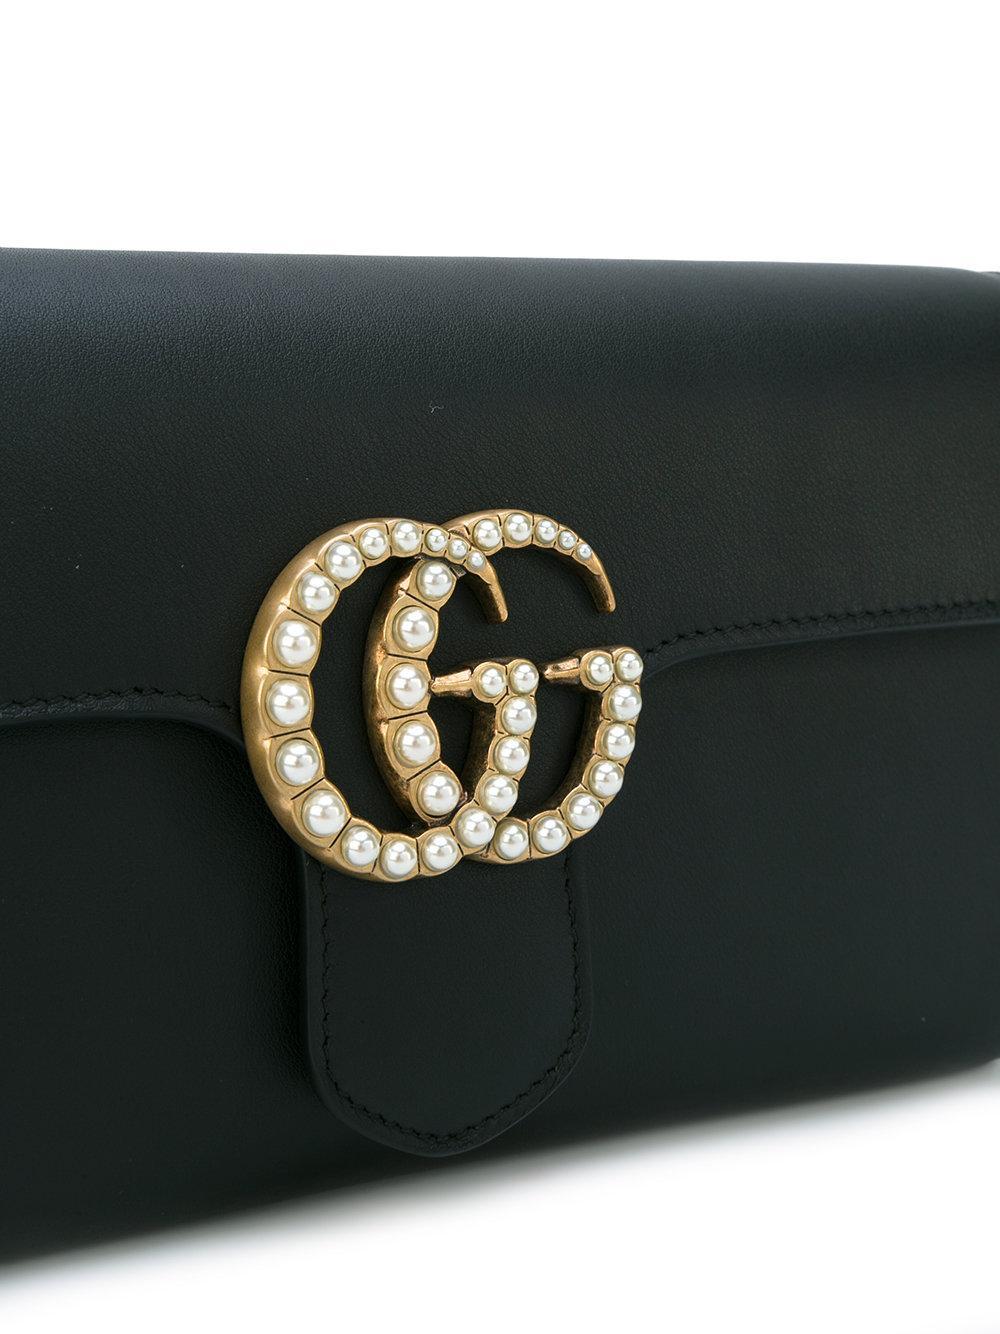 Gucci Leather Gg Logo Clutch Bag In Black Lyst